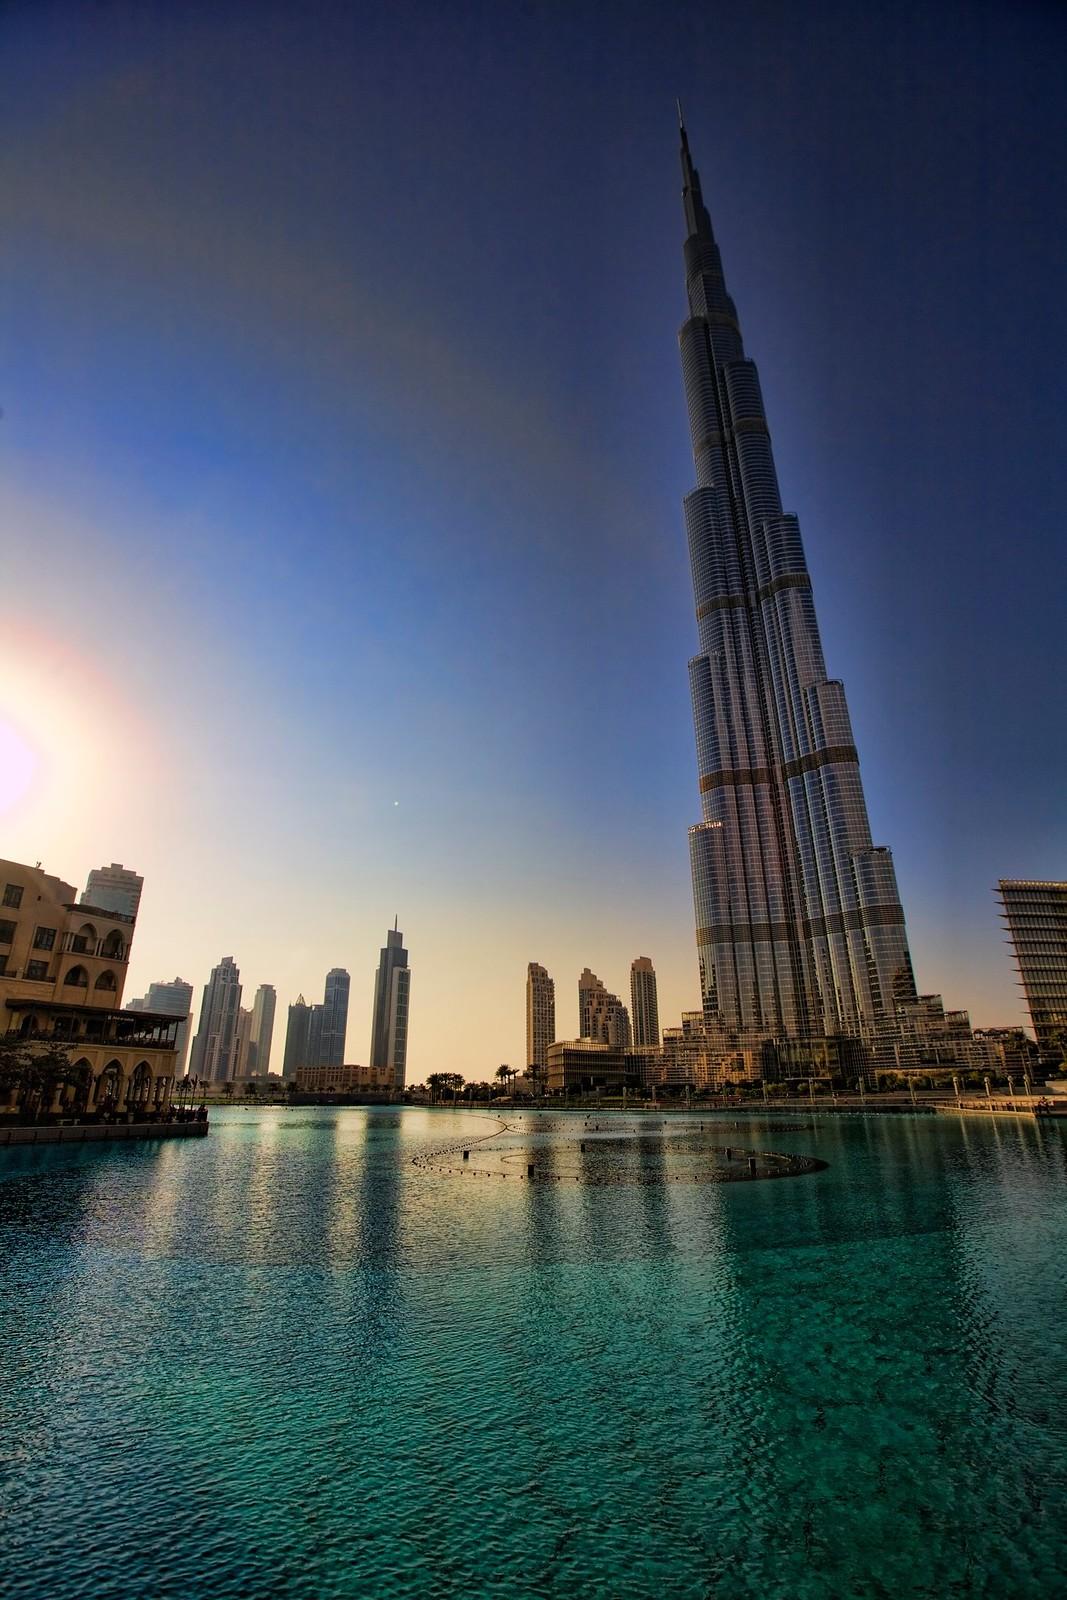 Majestic Burj Khalifa